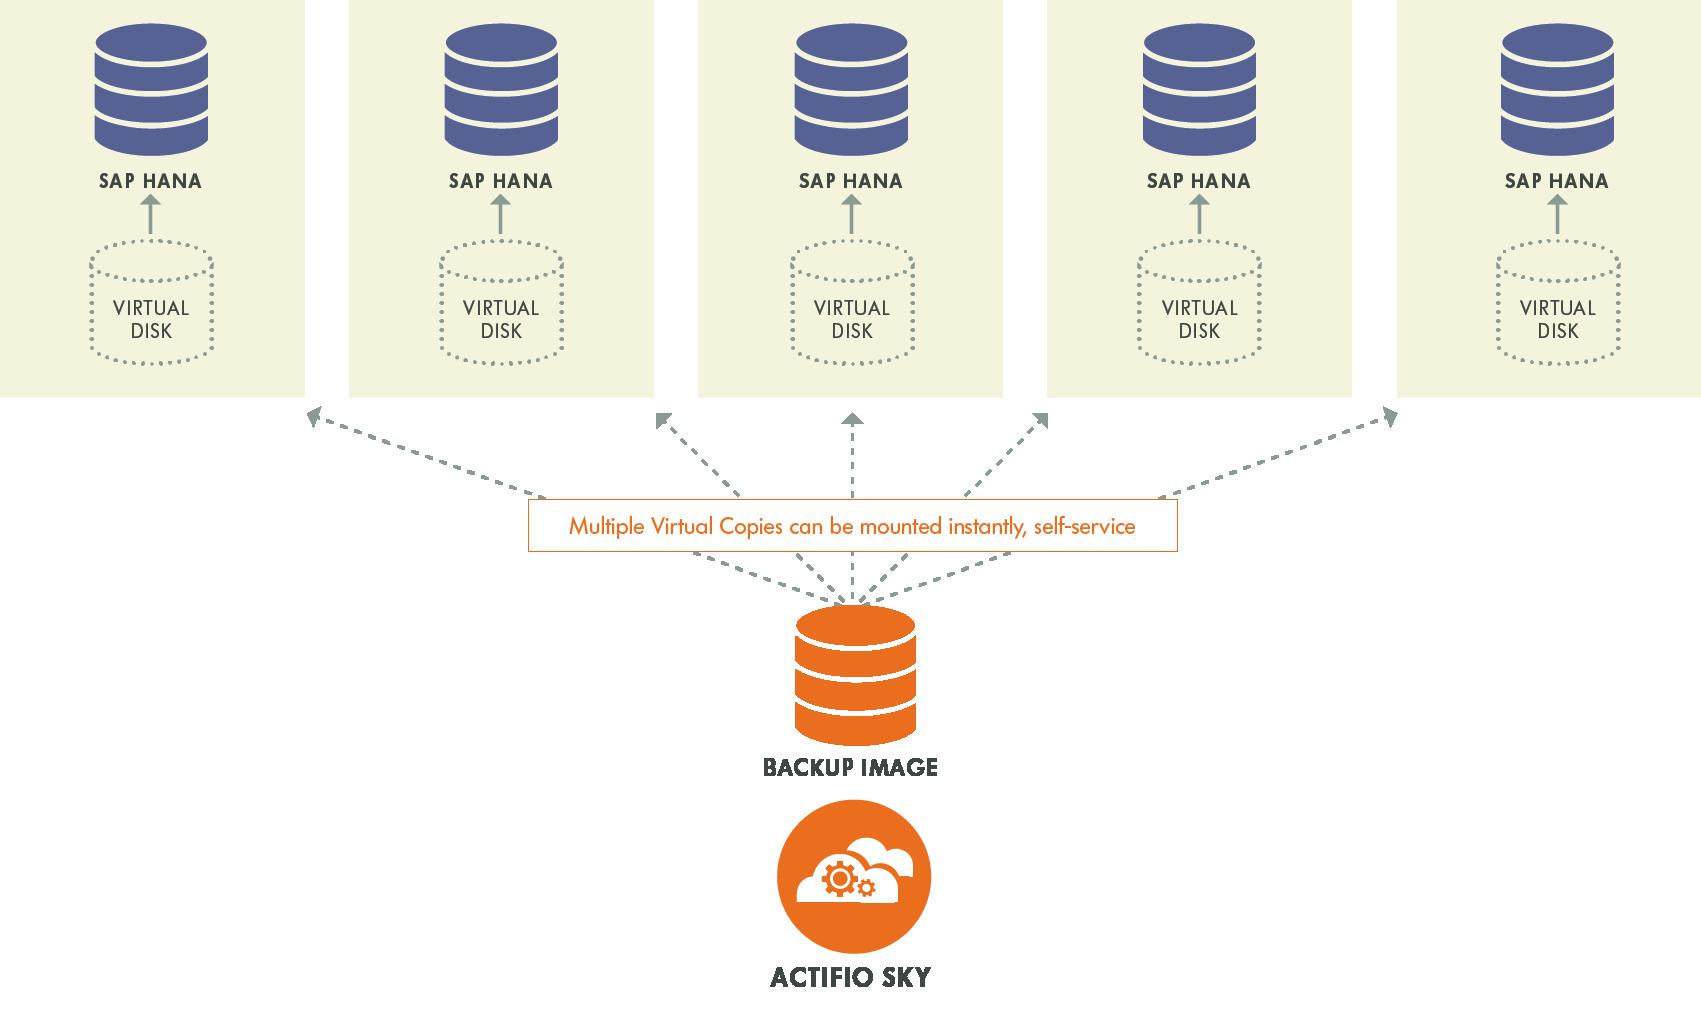 Sap Hana Data Management Protection Actifio 2 Block Diagram Sky For